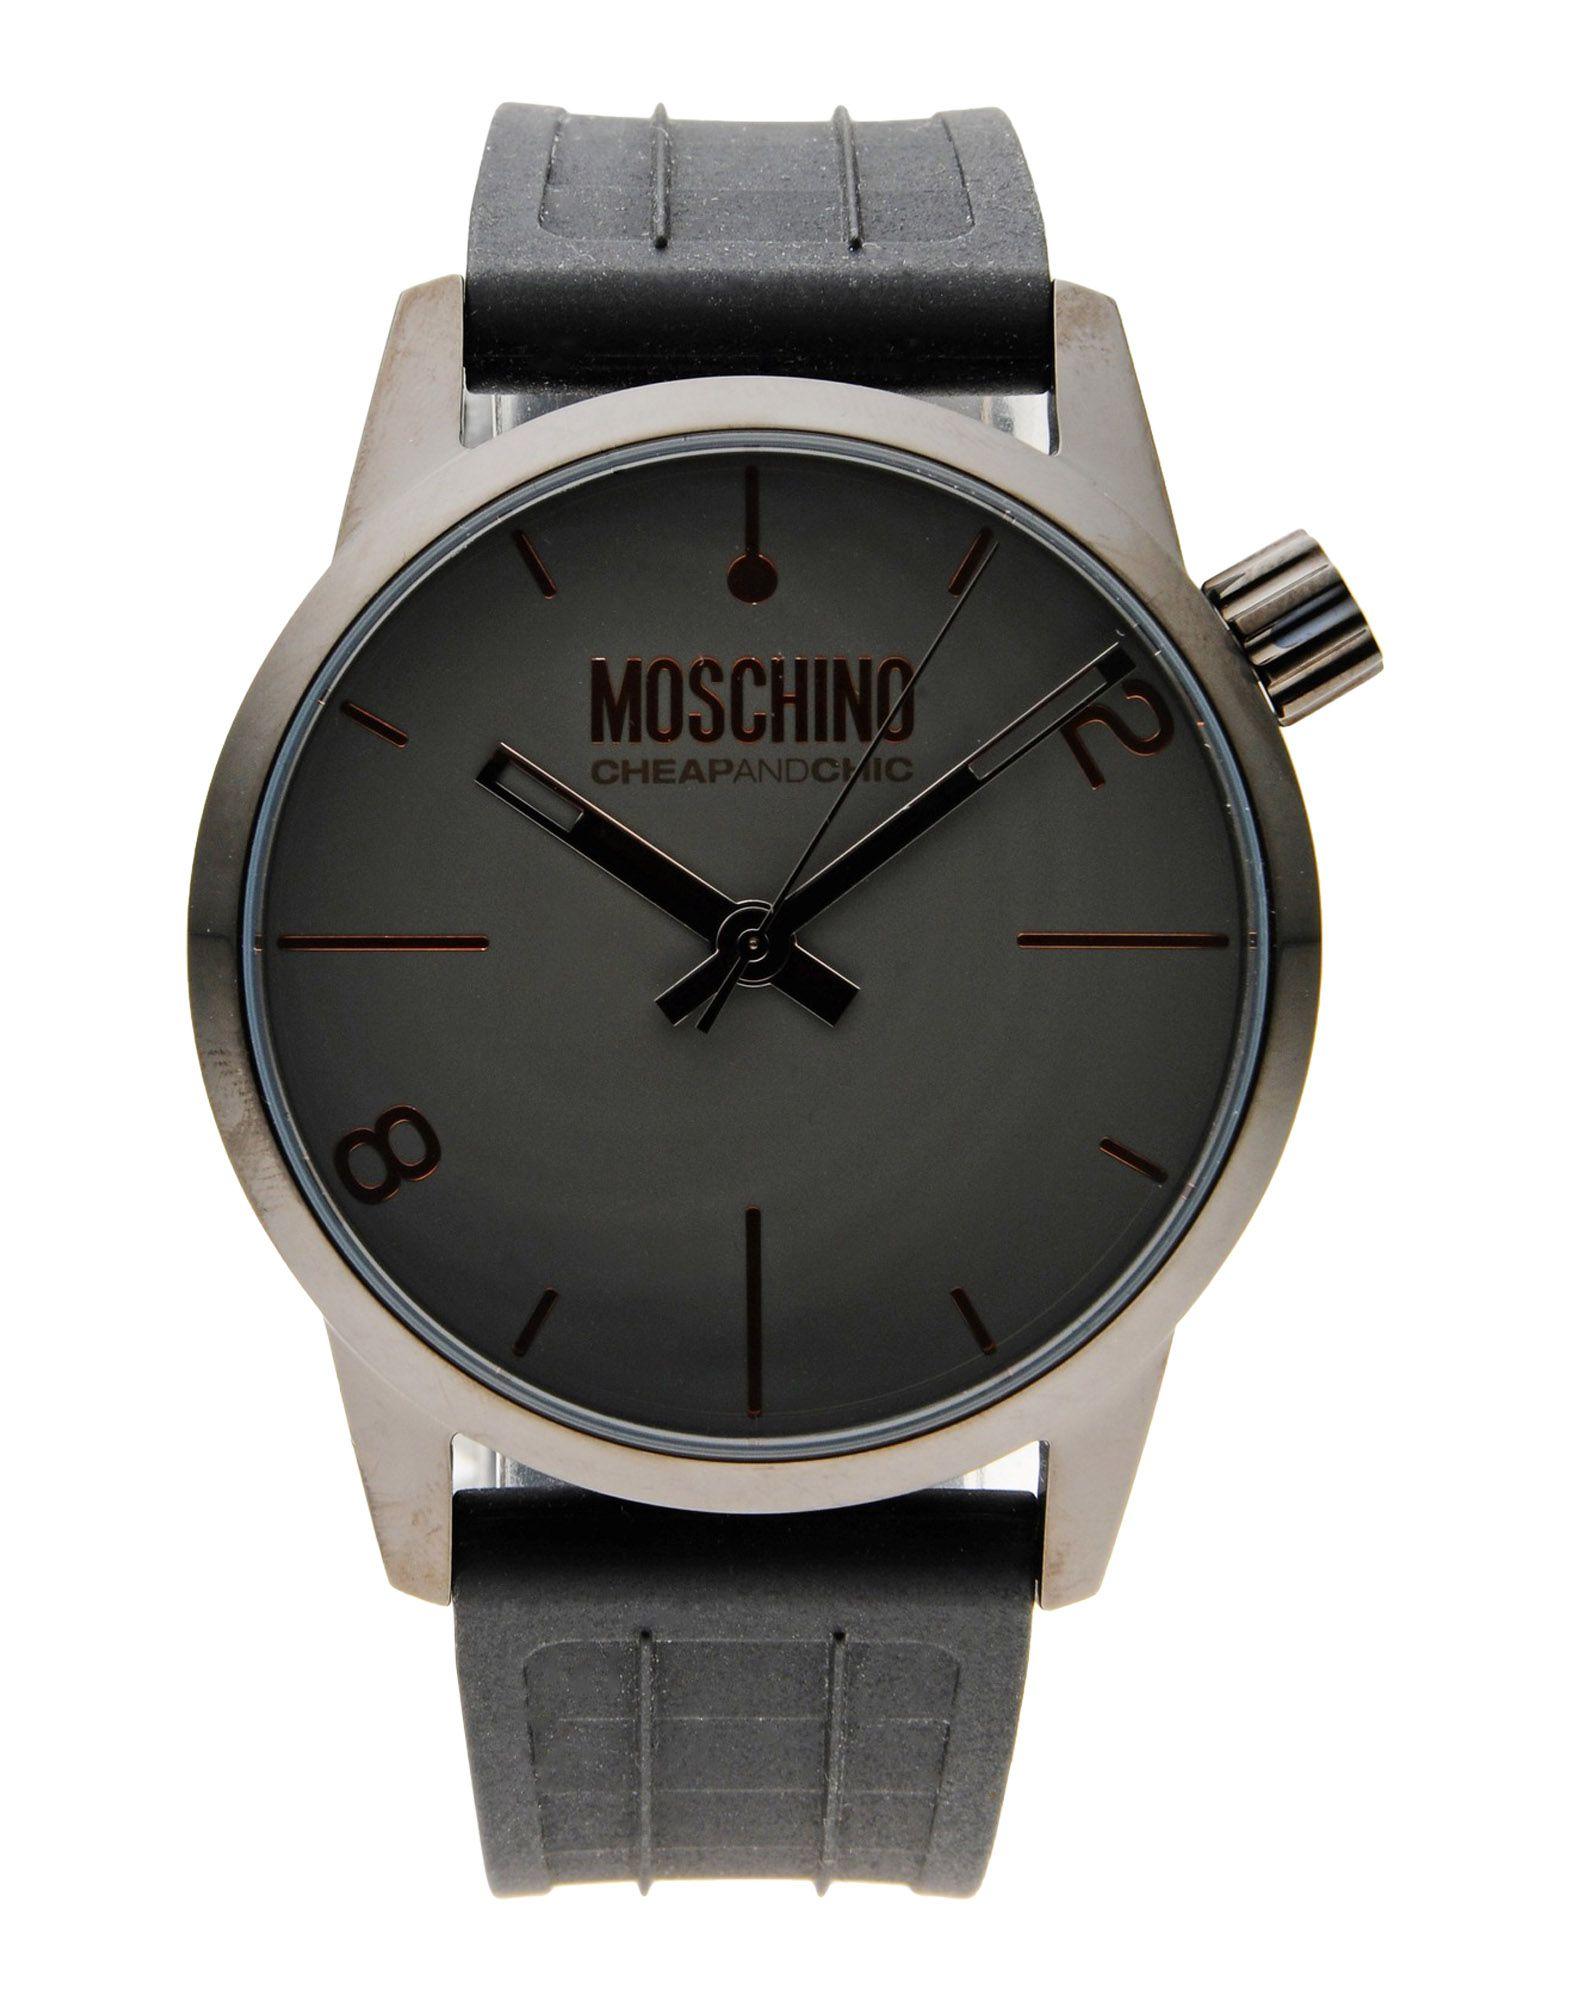 Moschino Cheap And Chic Wrist Watches